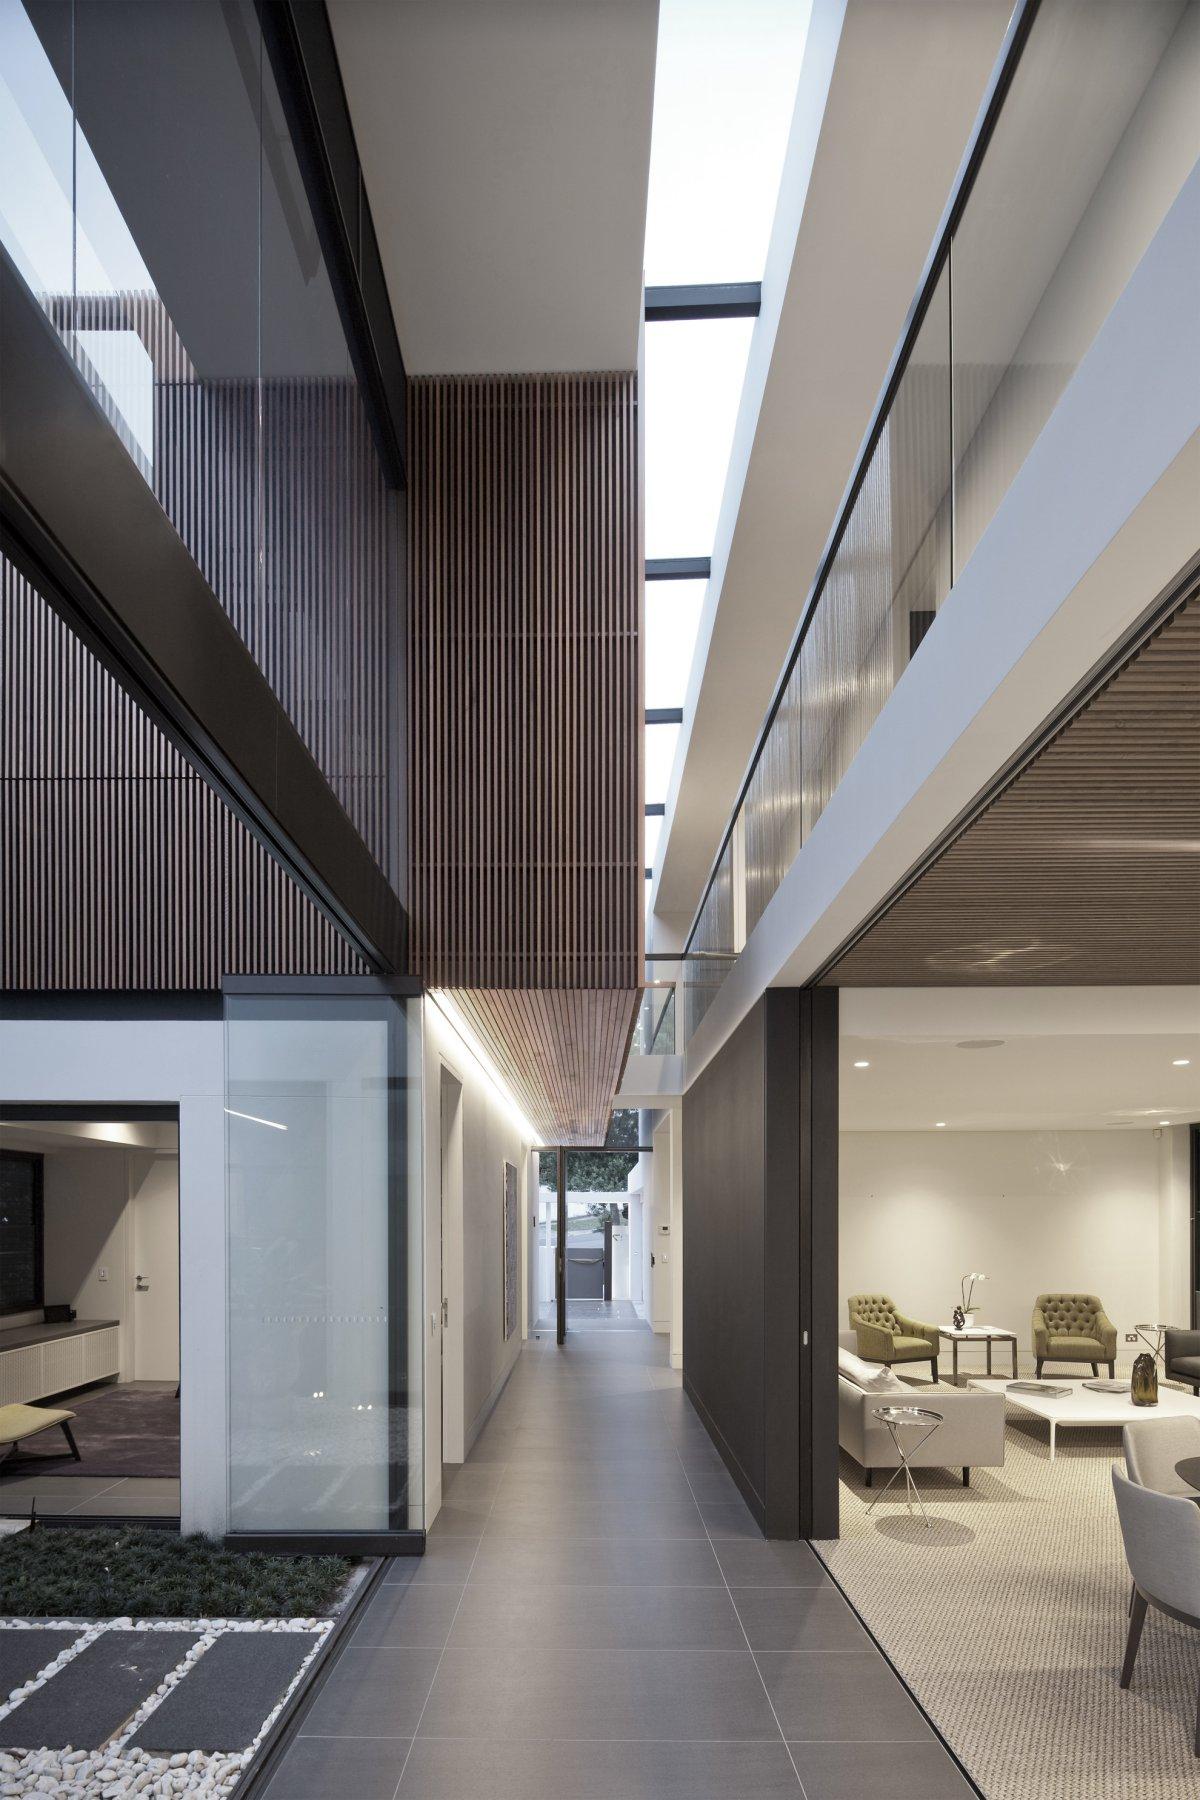 white-marble-floor-tiles-on-exterior-corridor